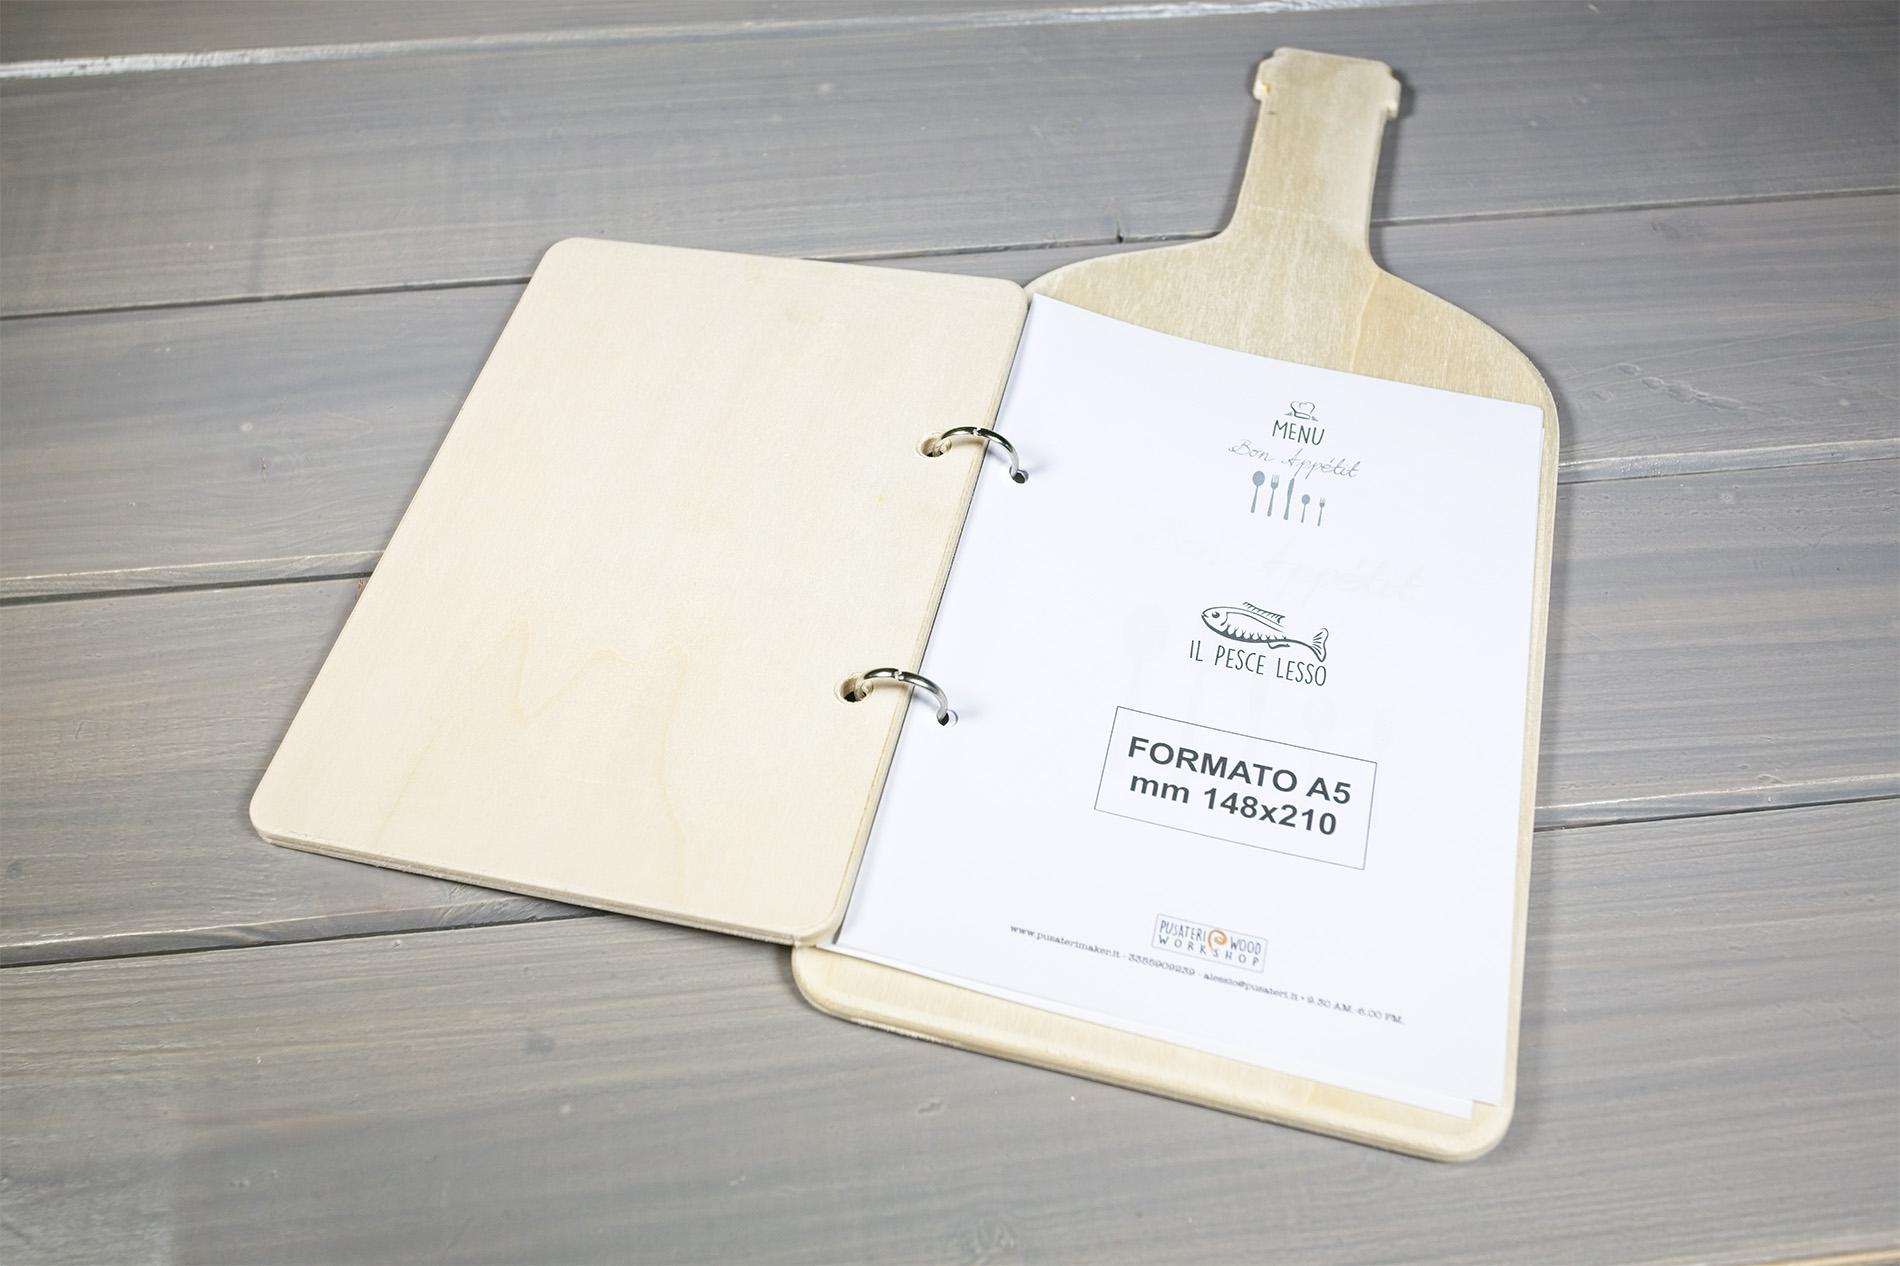 Portamenu Forma Di Bottiglia